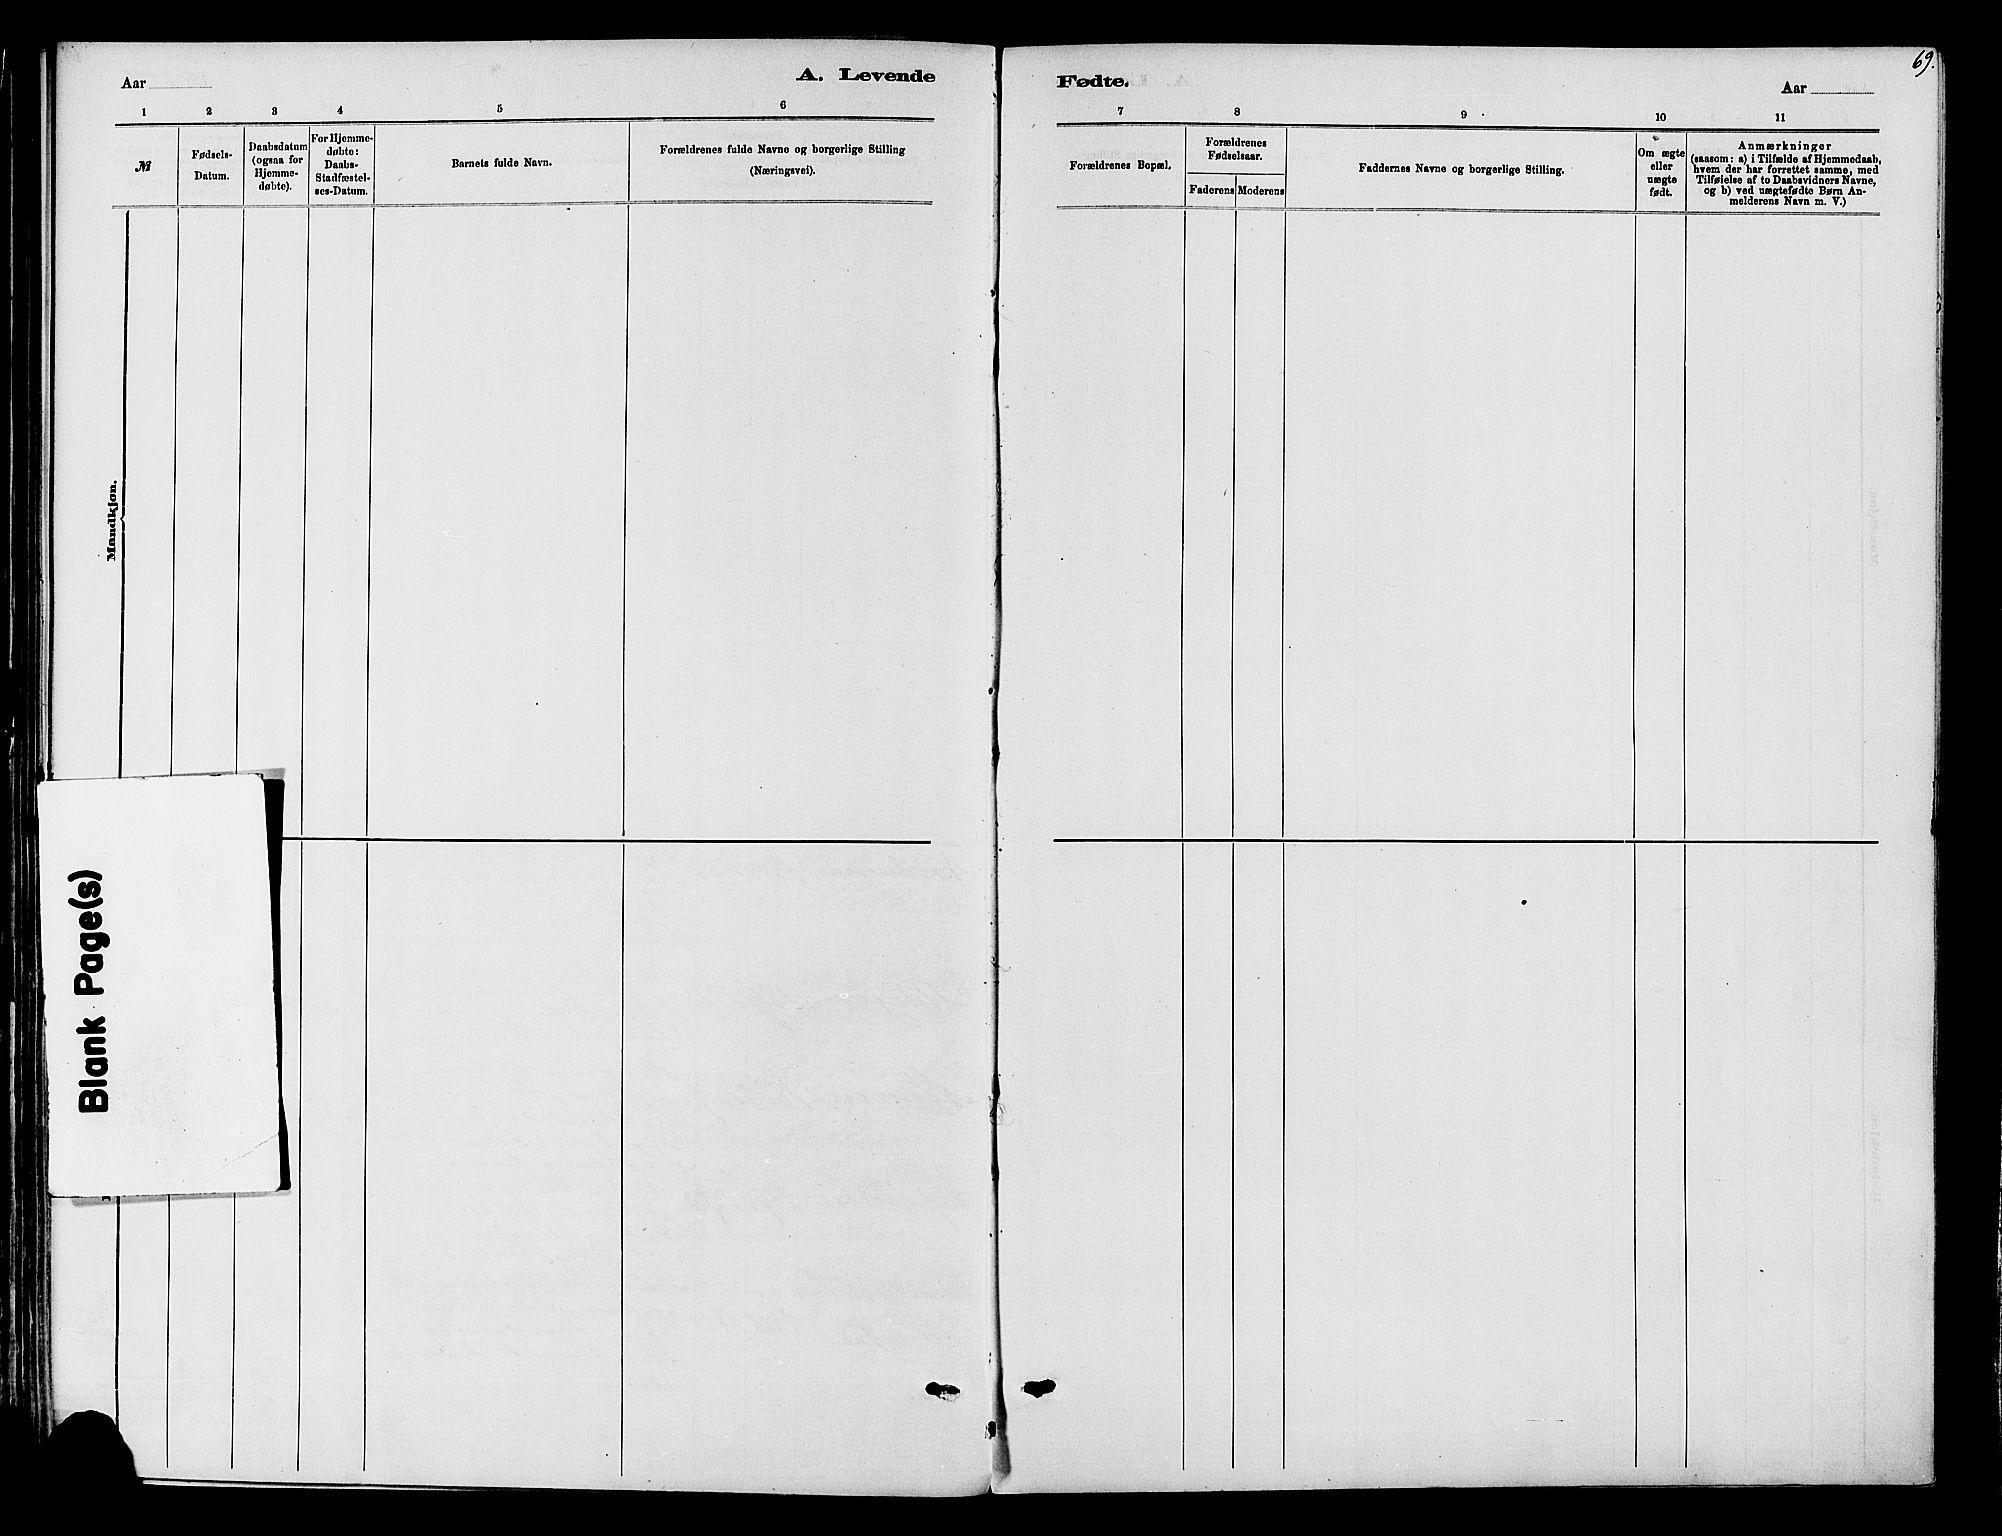 SAH, Vardal prestekontor, H/Ha/Haa/L0010: Ministerialbok nr. 10, 1878-1893, s. 69